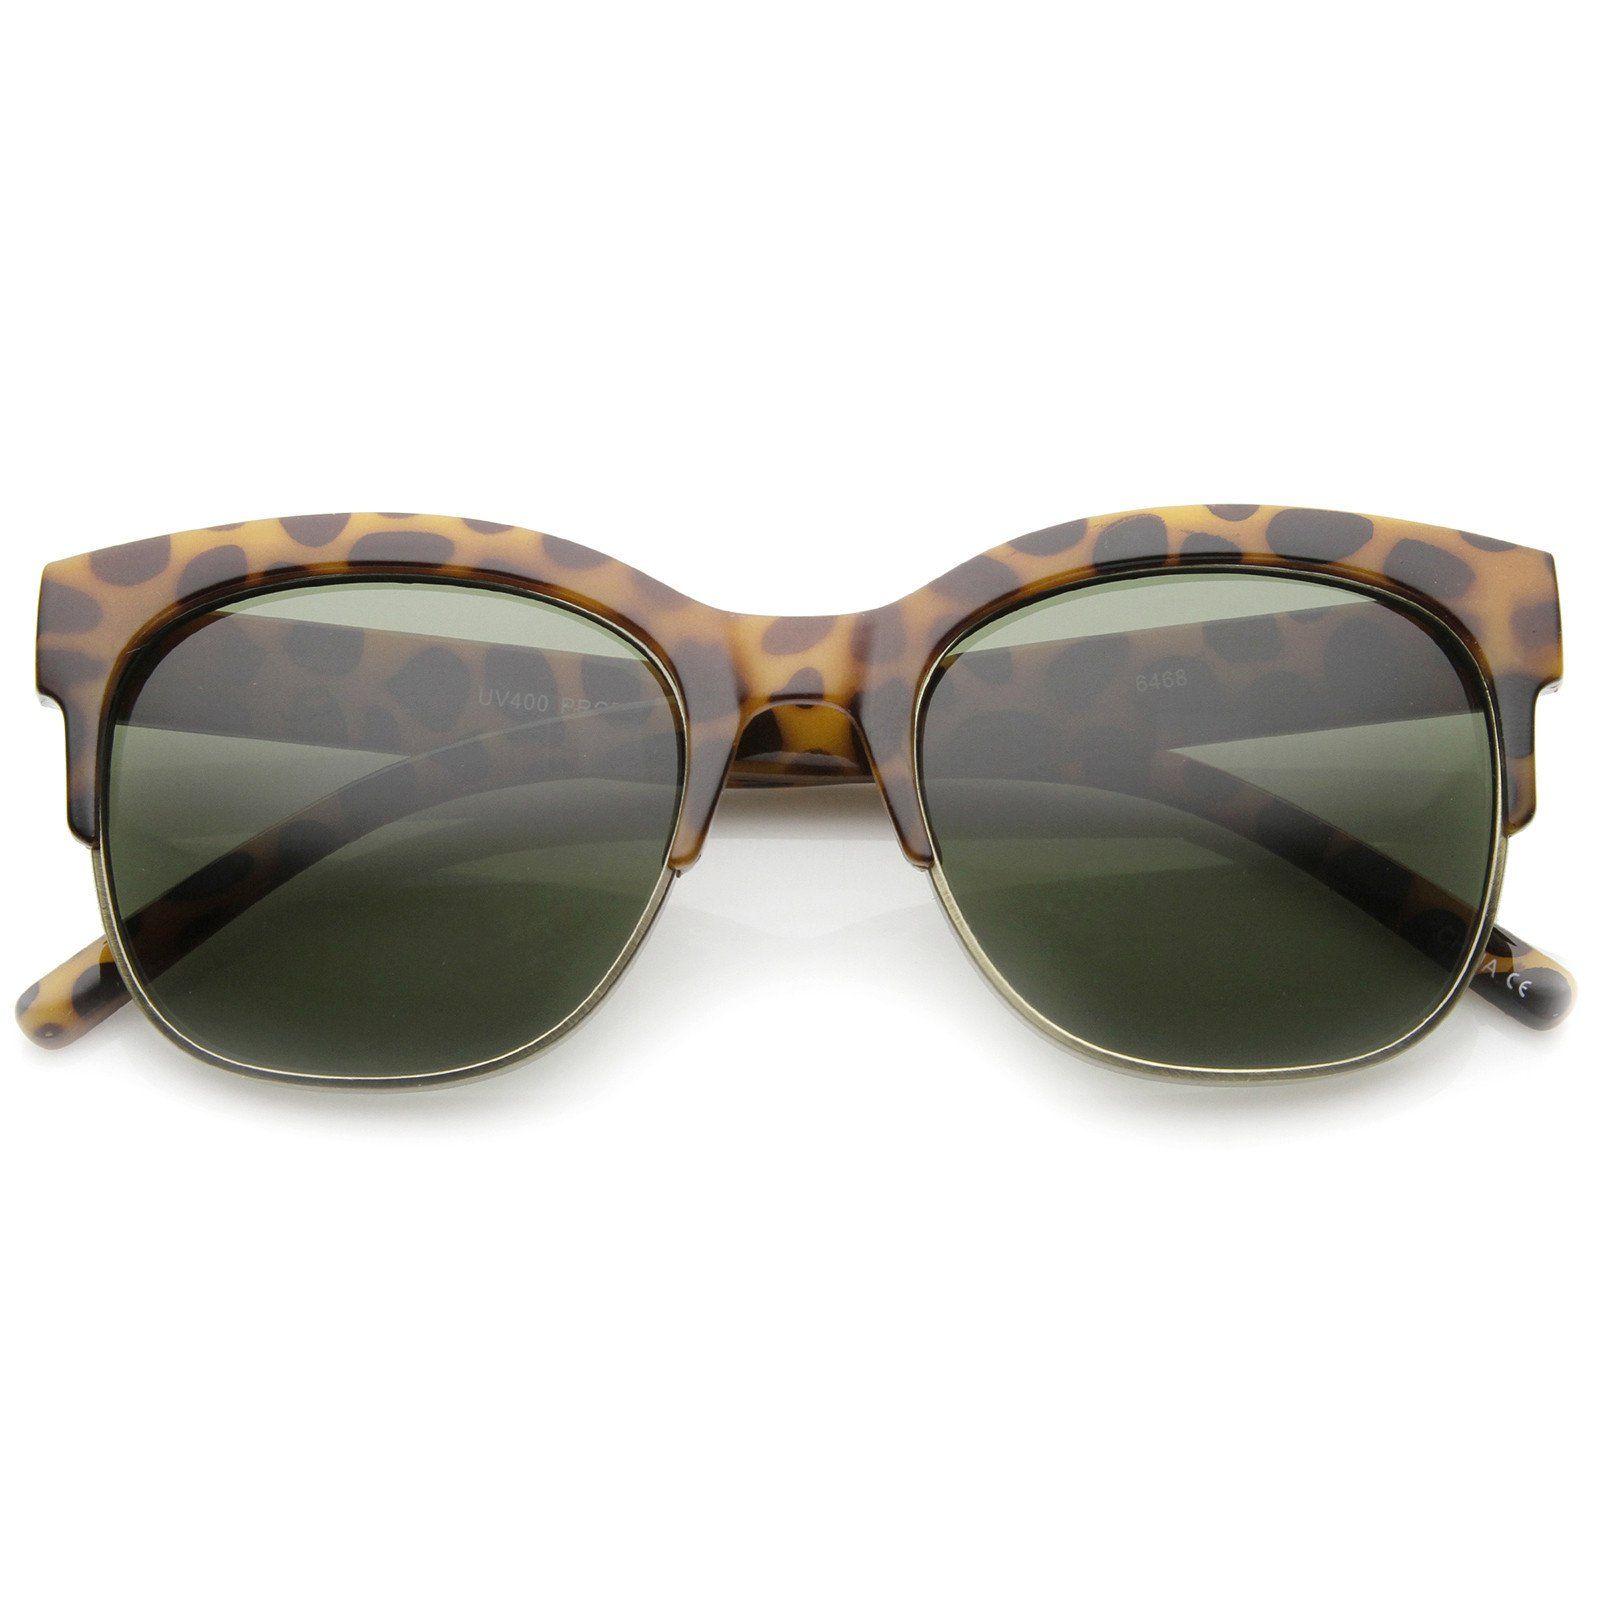 88cbfeff4f Womens Semi-Rimless Sunglasses With UV400 Protected Composite Lens ...